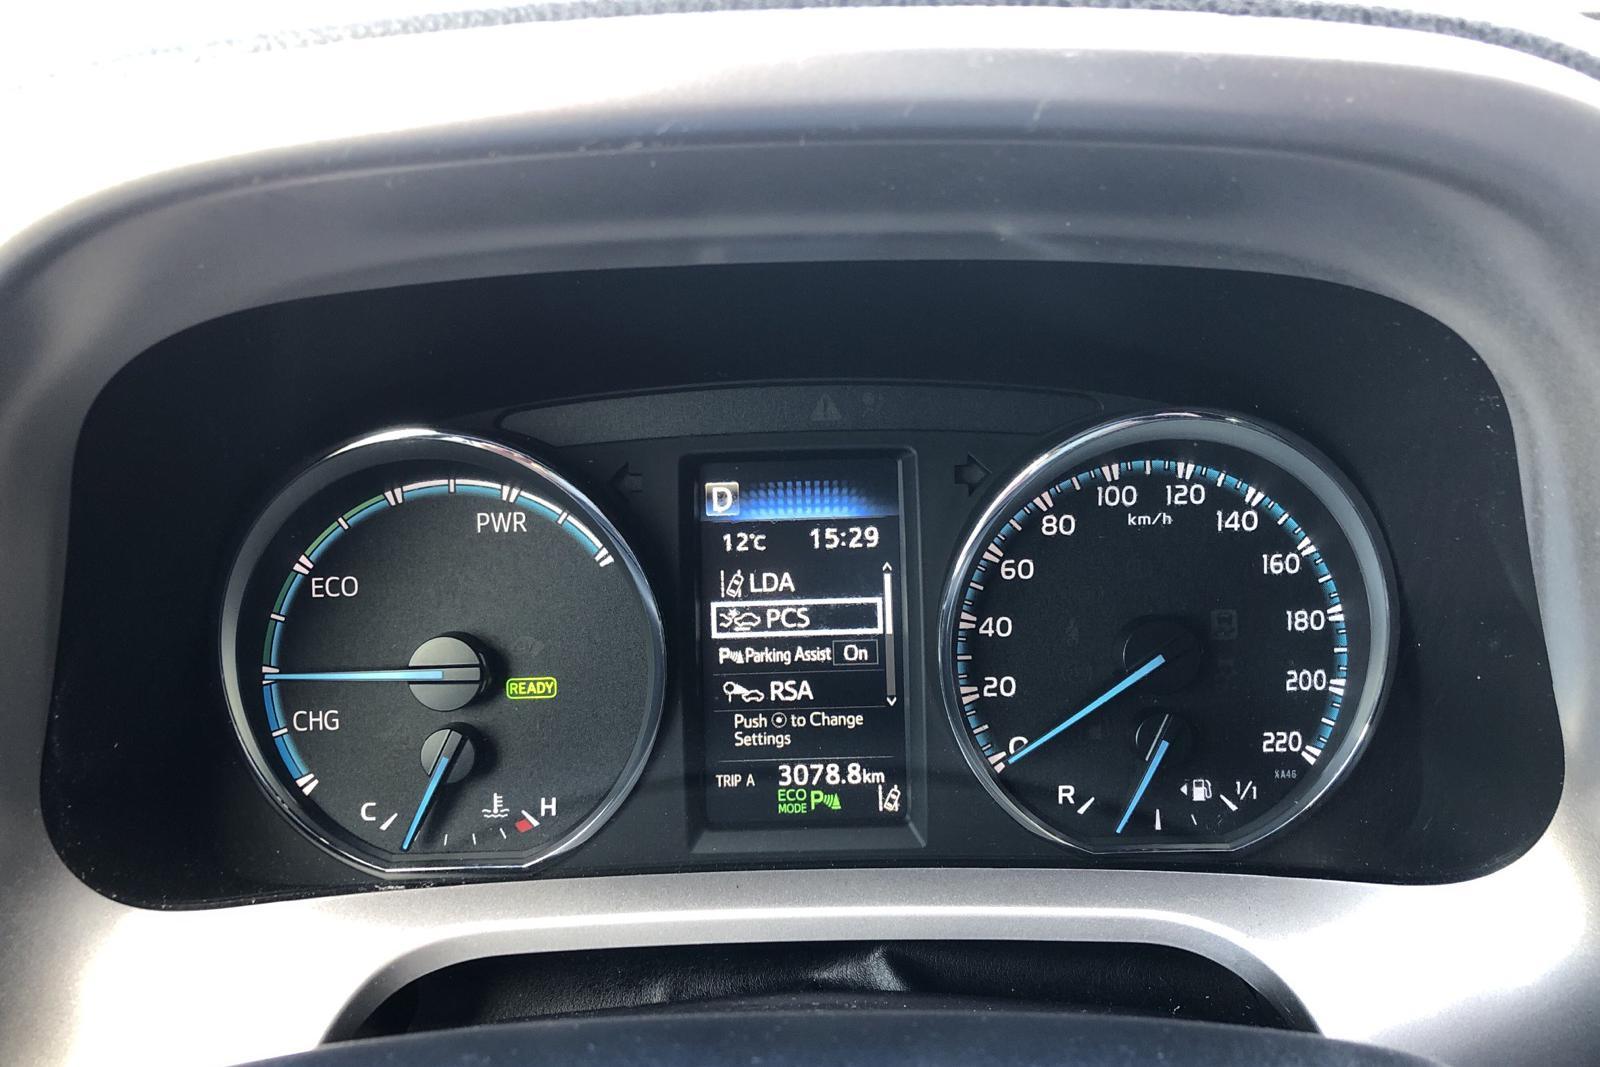 Toyota RAV4 2.5 HSD AWD (197hk) - 123 090 km - Automatic - white - 2018